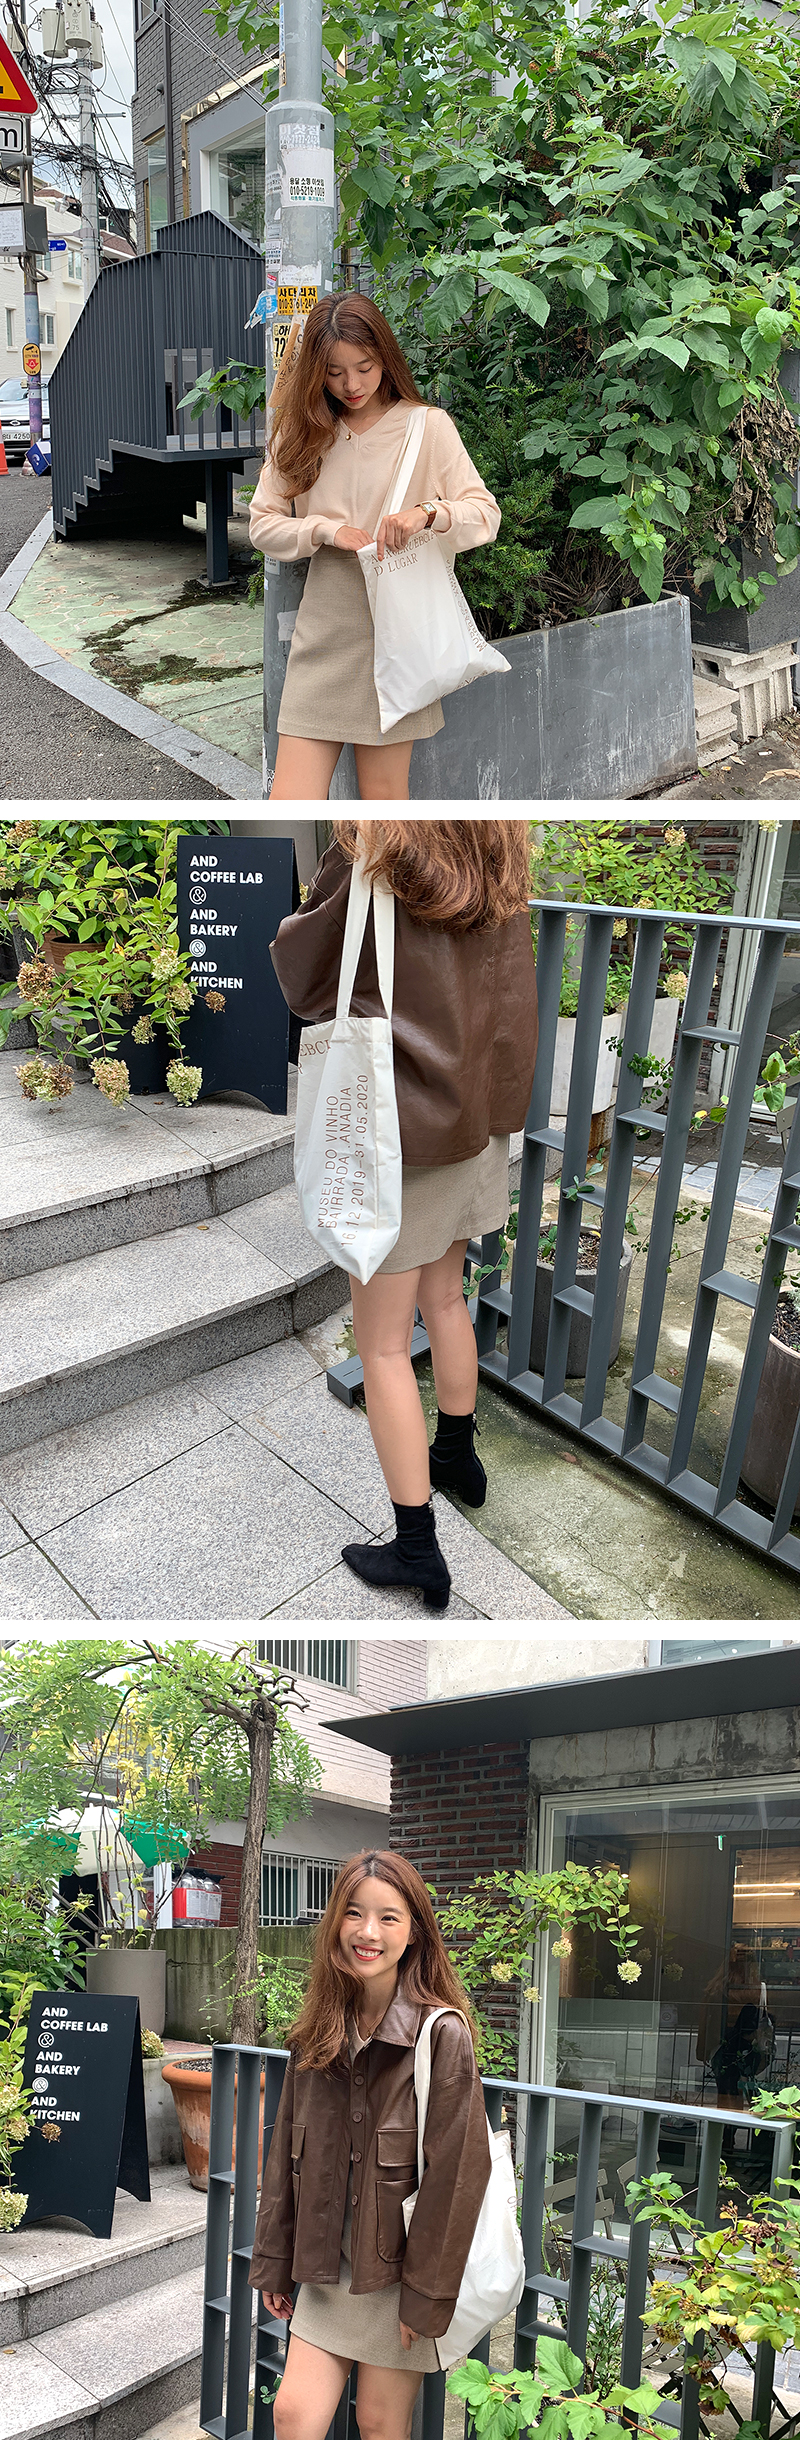 Anne still check skirt_U